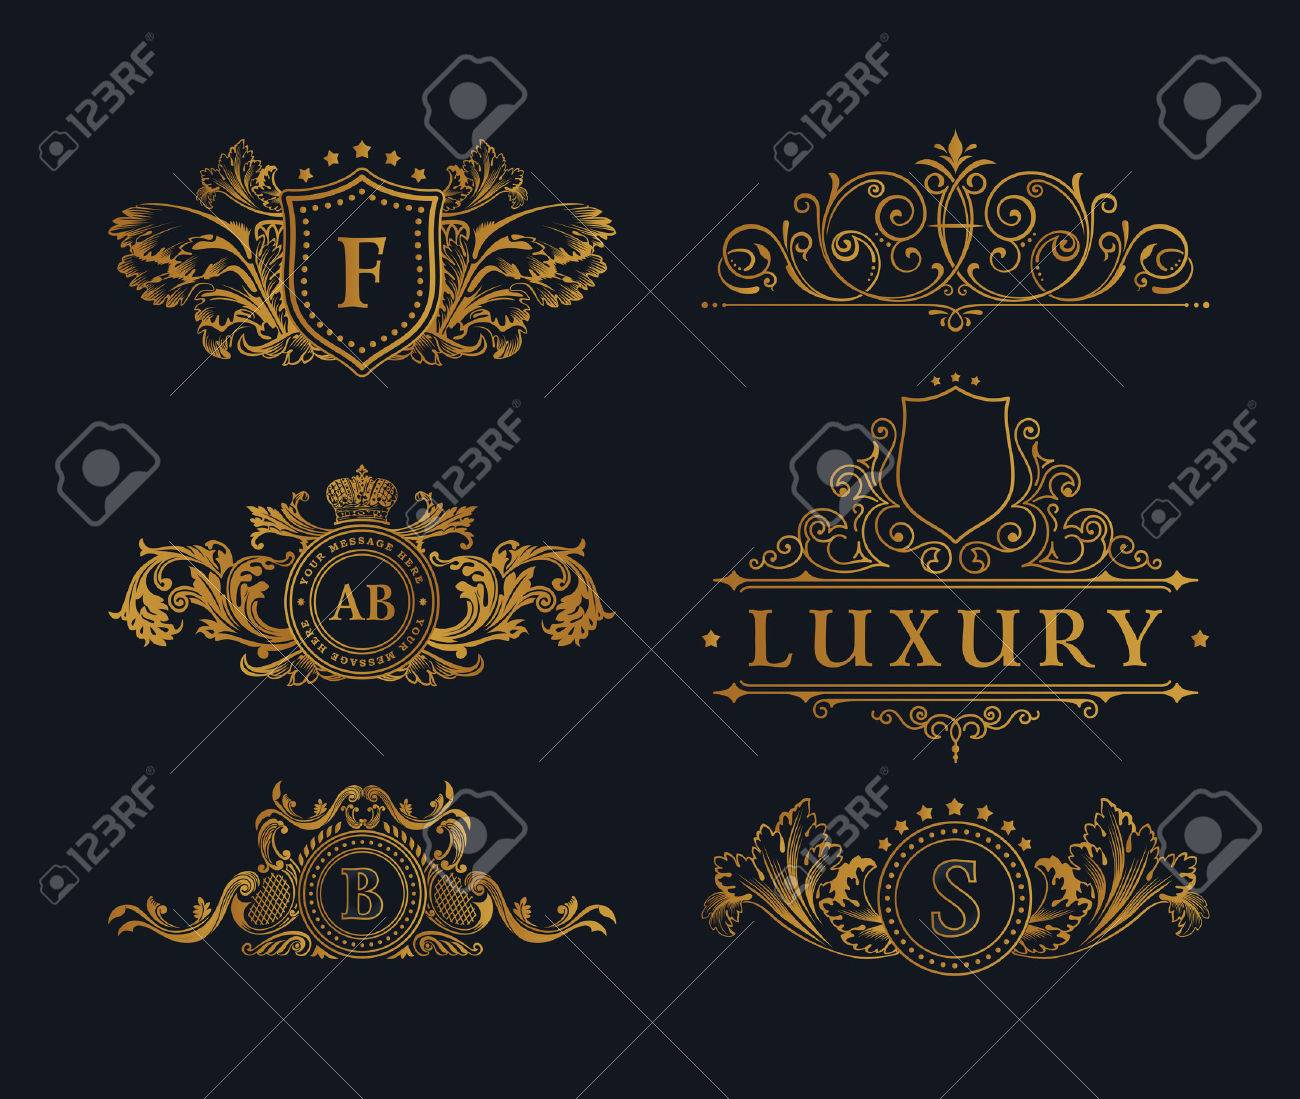 Vintage gold Elements. Flourishes Calligraphic Ornament. Elegant emblem monogram luxury . Floral royal line design. sign, restaurant boutique, heraldic fashion, cafe hotel - 59914306